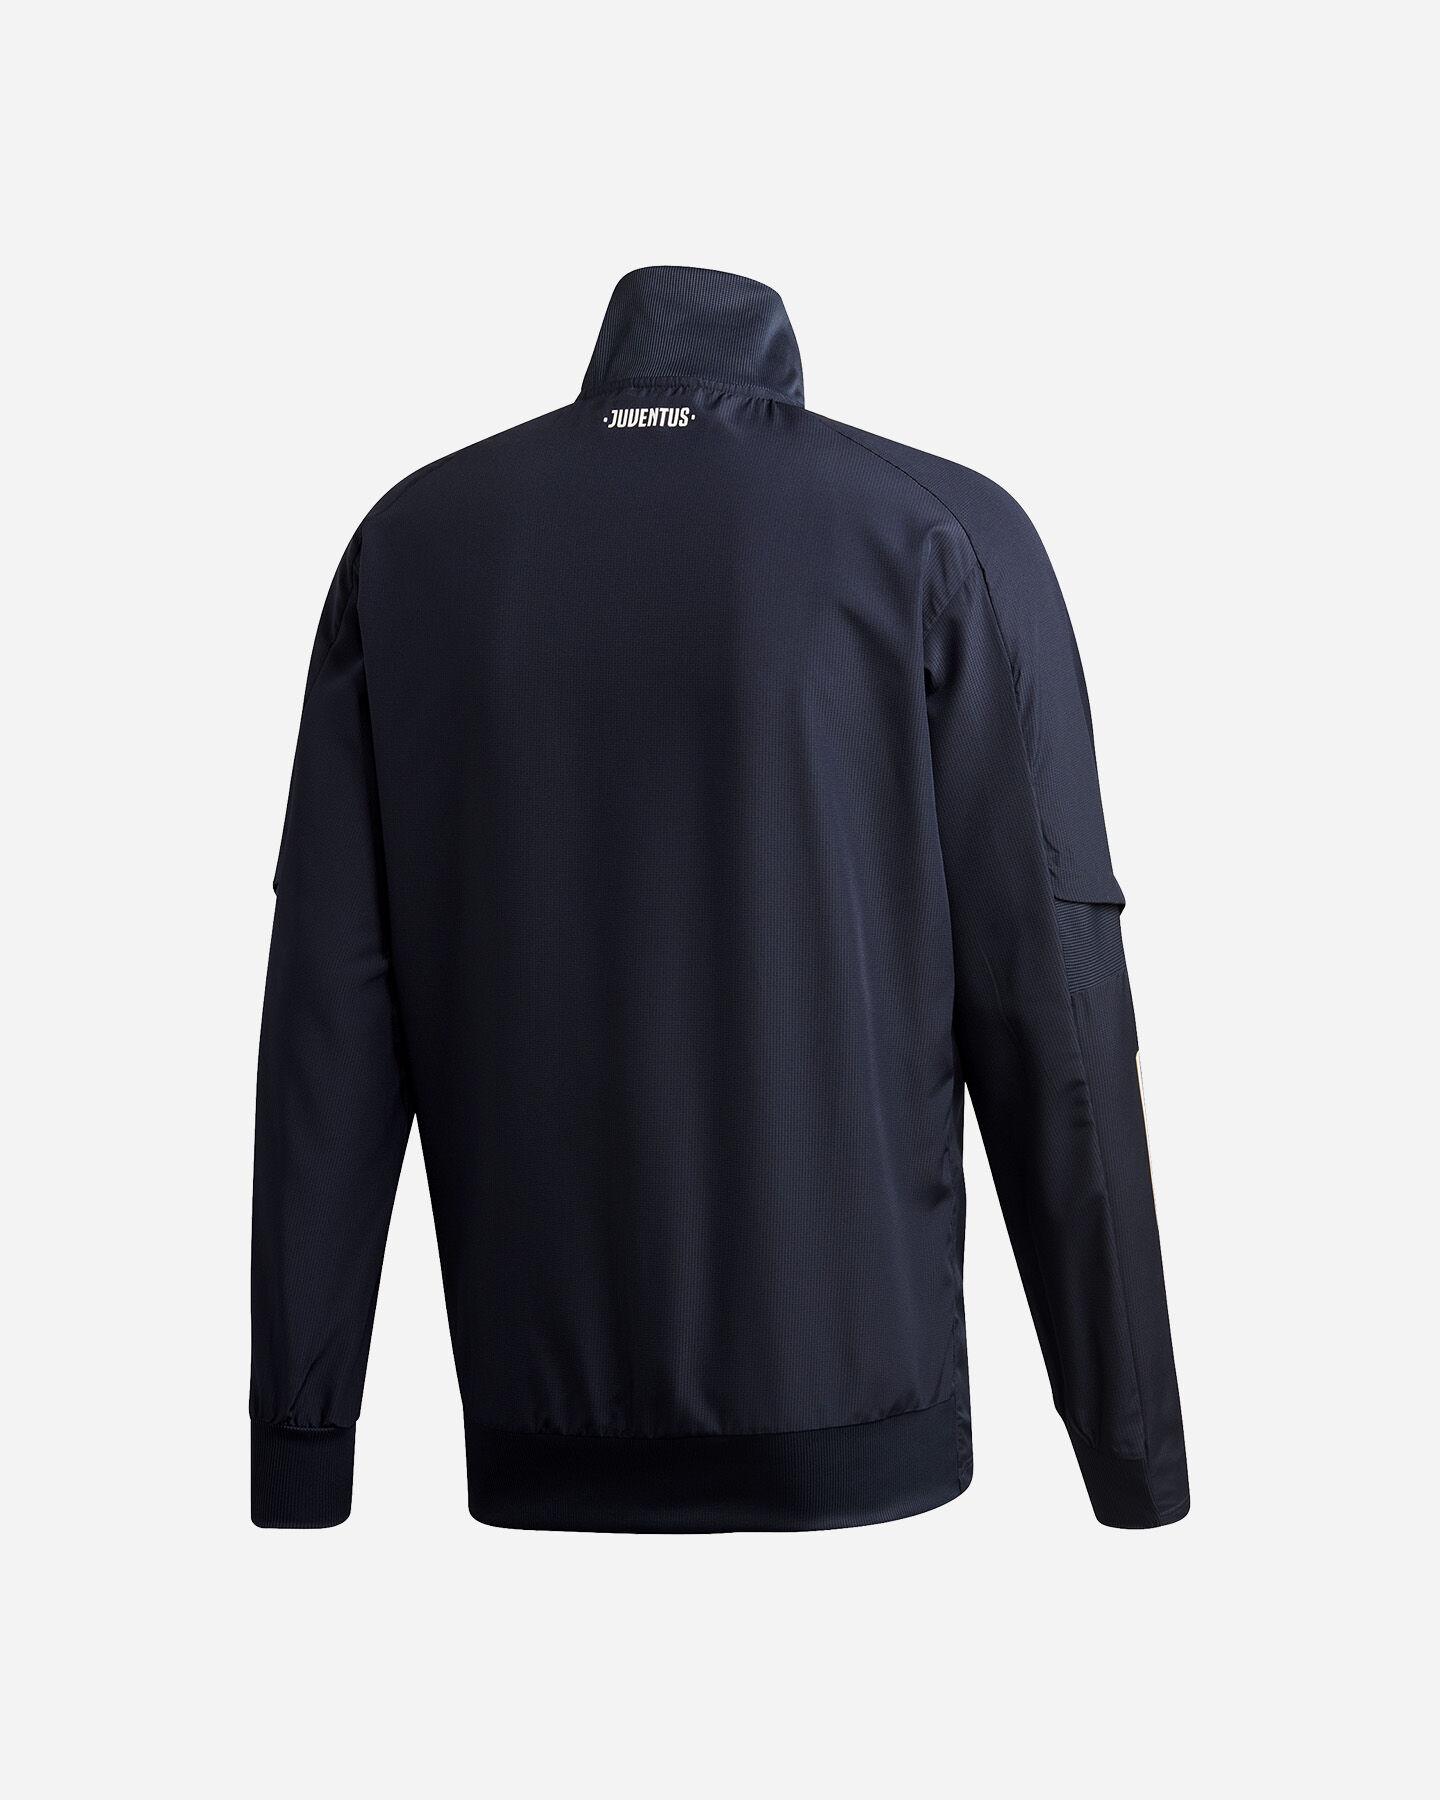 Abbigliamento calcio ADIDAS JUVENTUS PRESENTATION 20/21 M S5217530 scatto 1